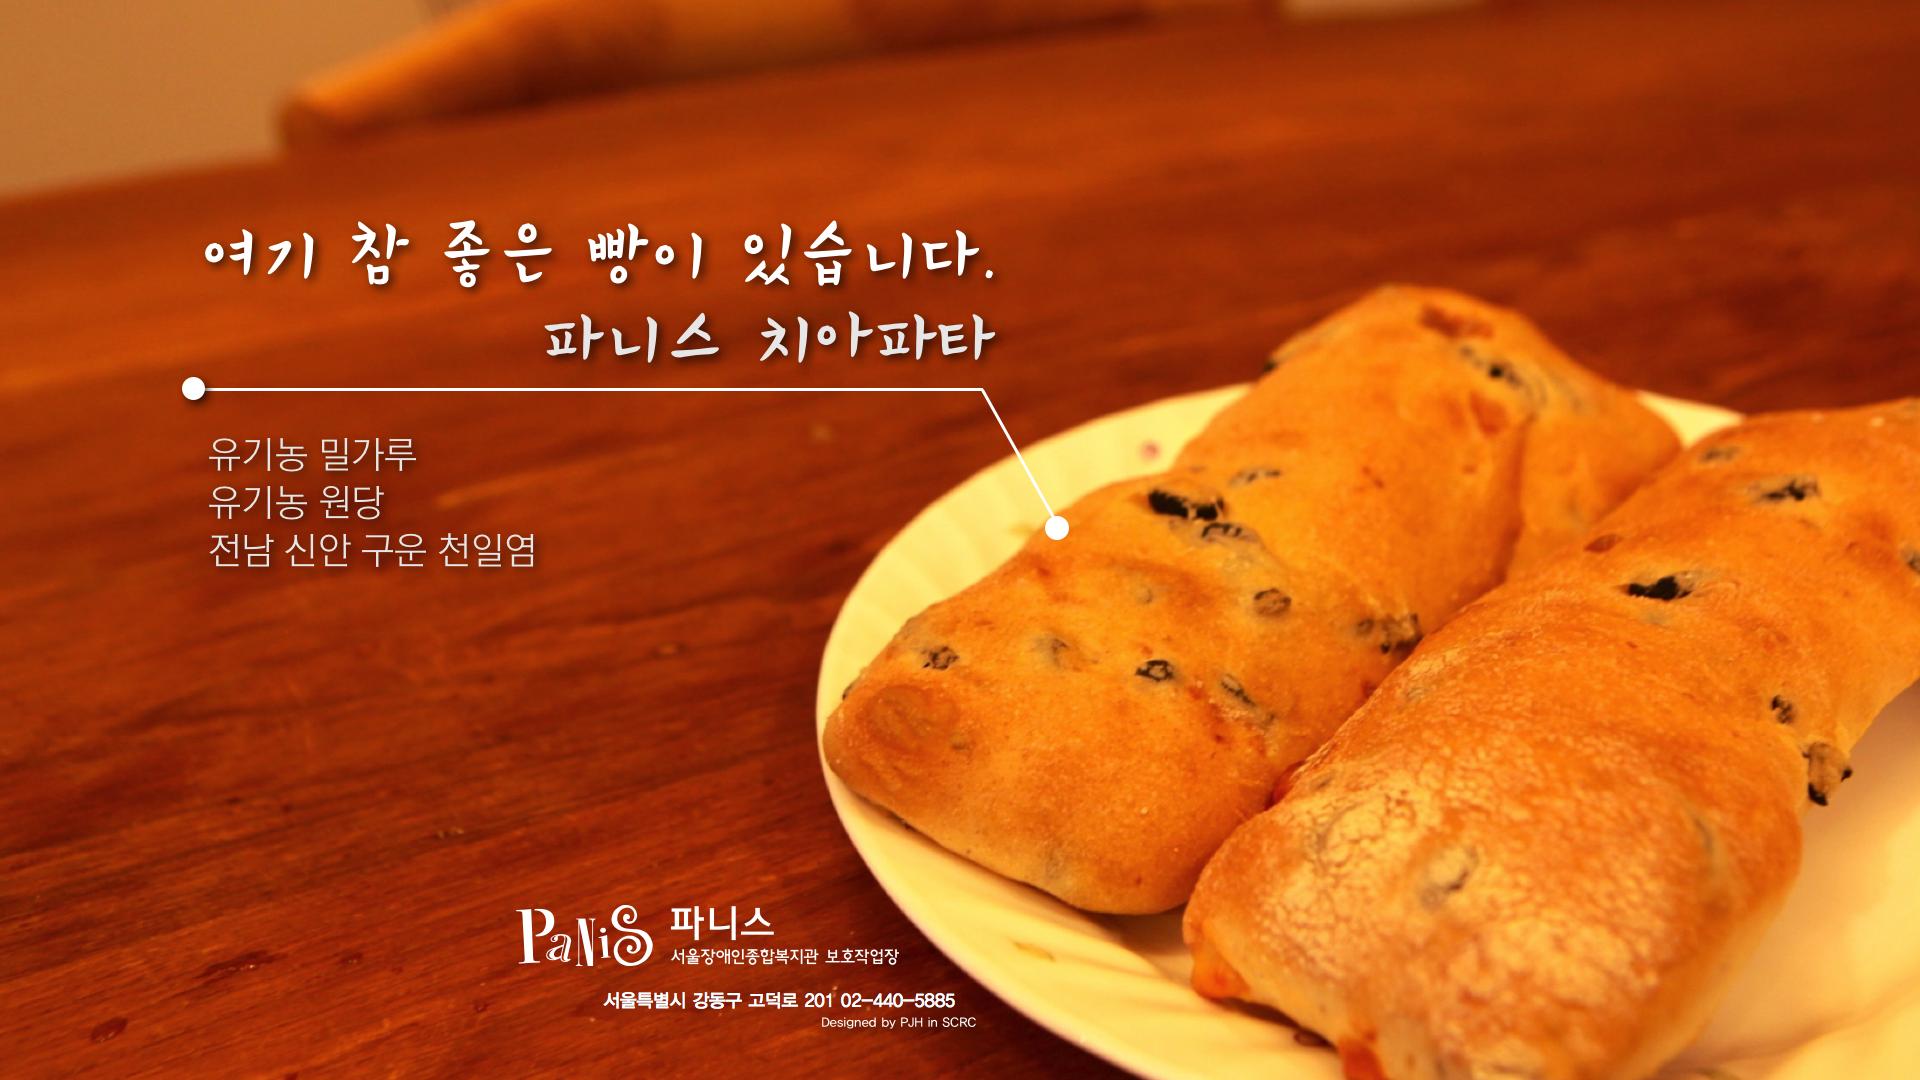 Panis, Seoul Community Rehabilitation Center 2014 www.seoulrehab.or.kr 시립서울장애인종합복지관 보호작업장 파니스 제작 : 기획홍보실